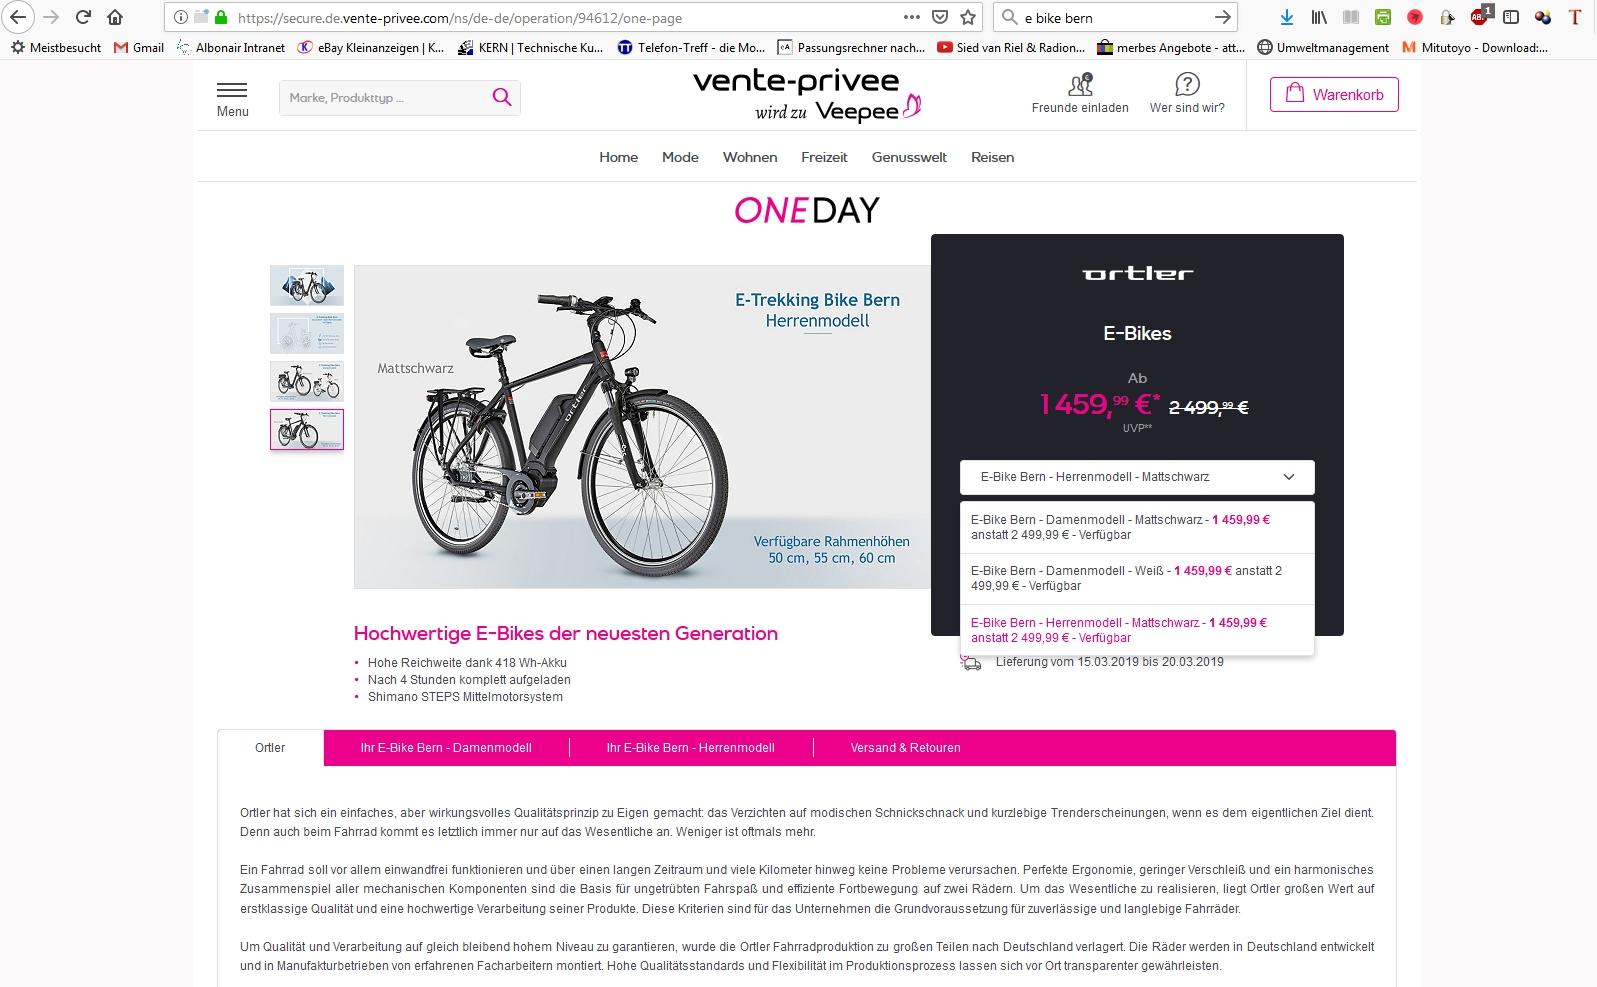 Vente-privee.de Ortler E-Bike(s) BERN (m/w)